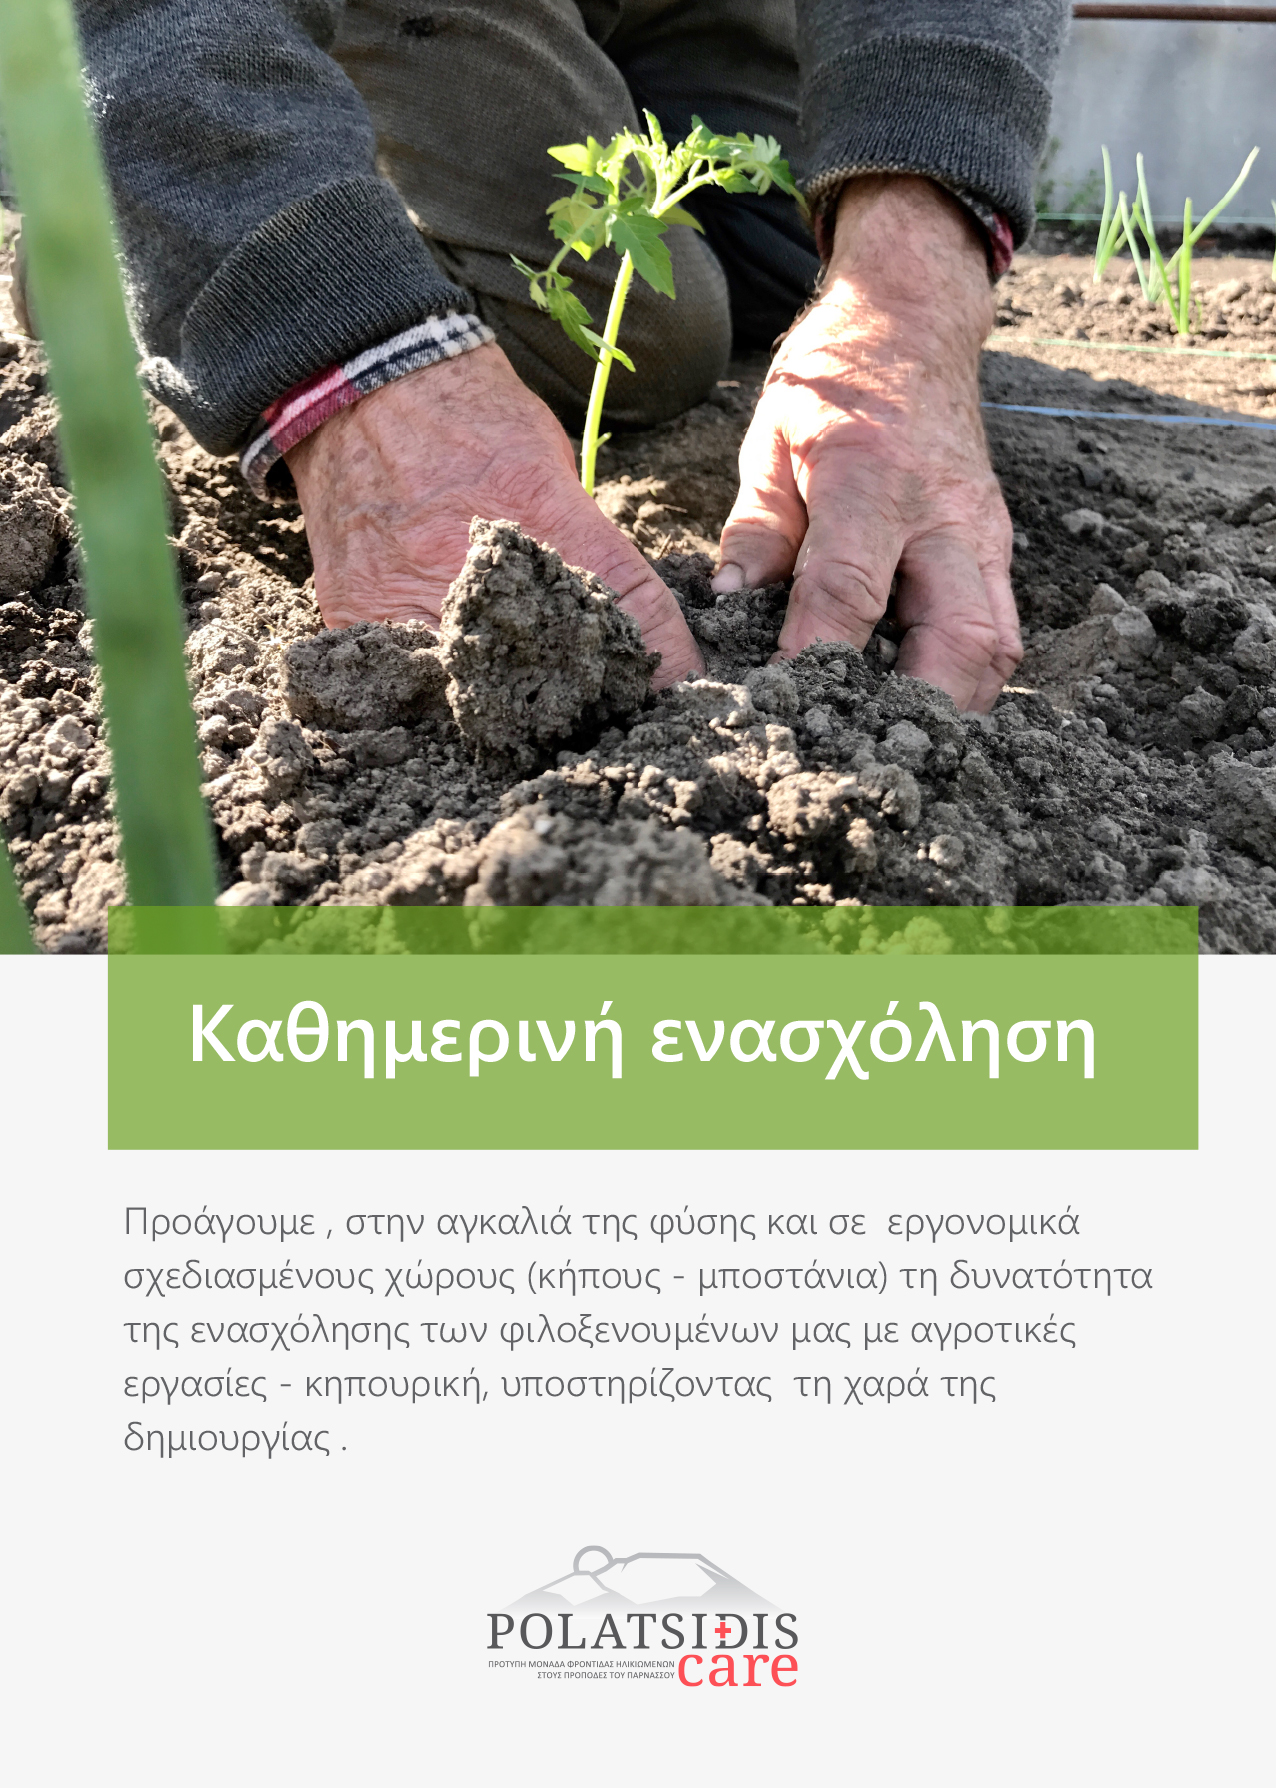 Polatsidis Care - Πρότυπη Μονάδα Φροντίδας Ηλικιωμένων